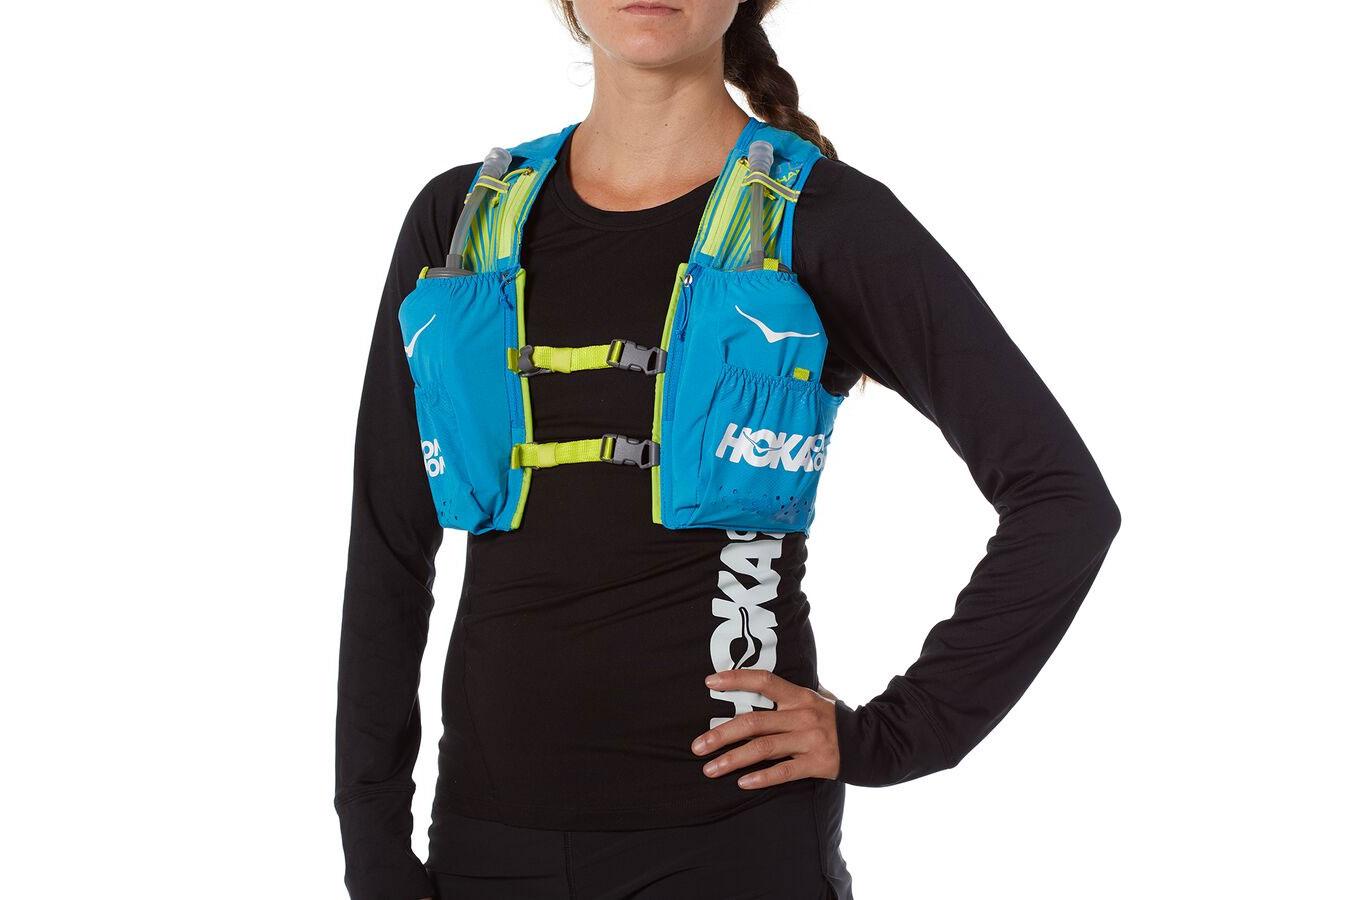 women's hoka race vest